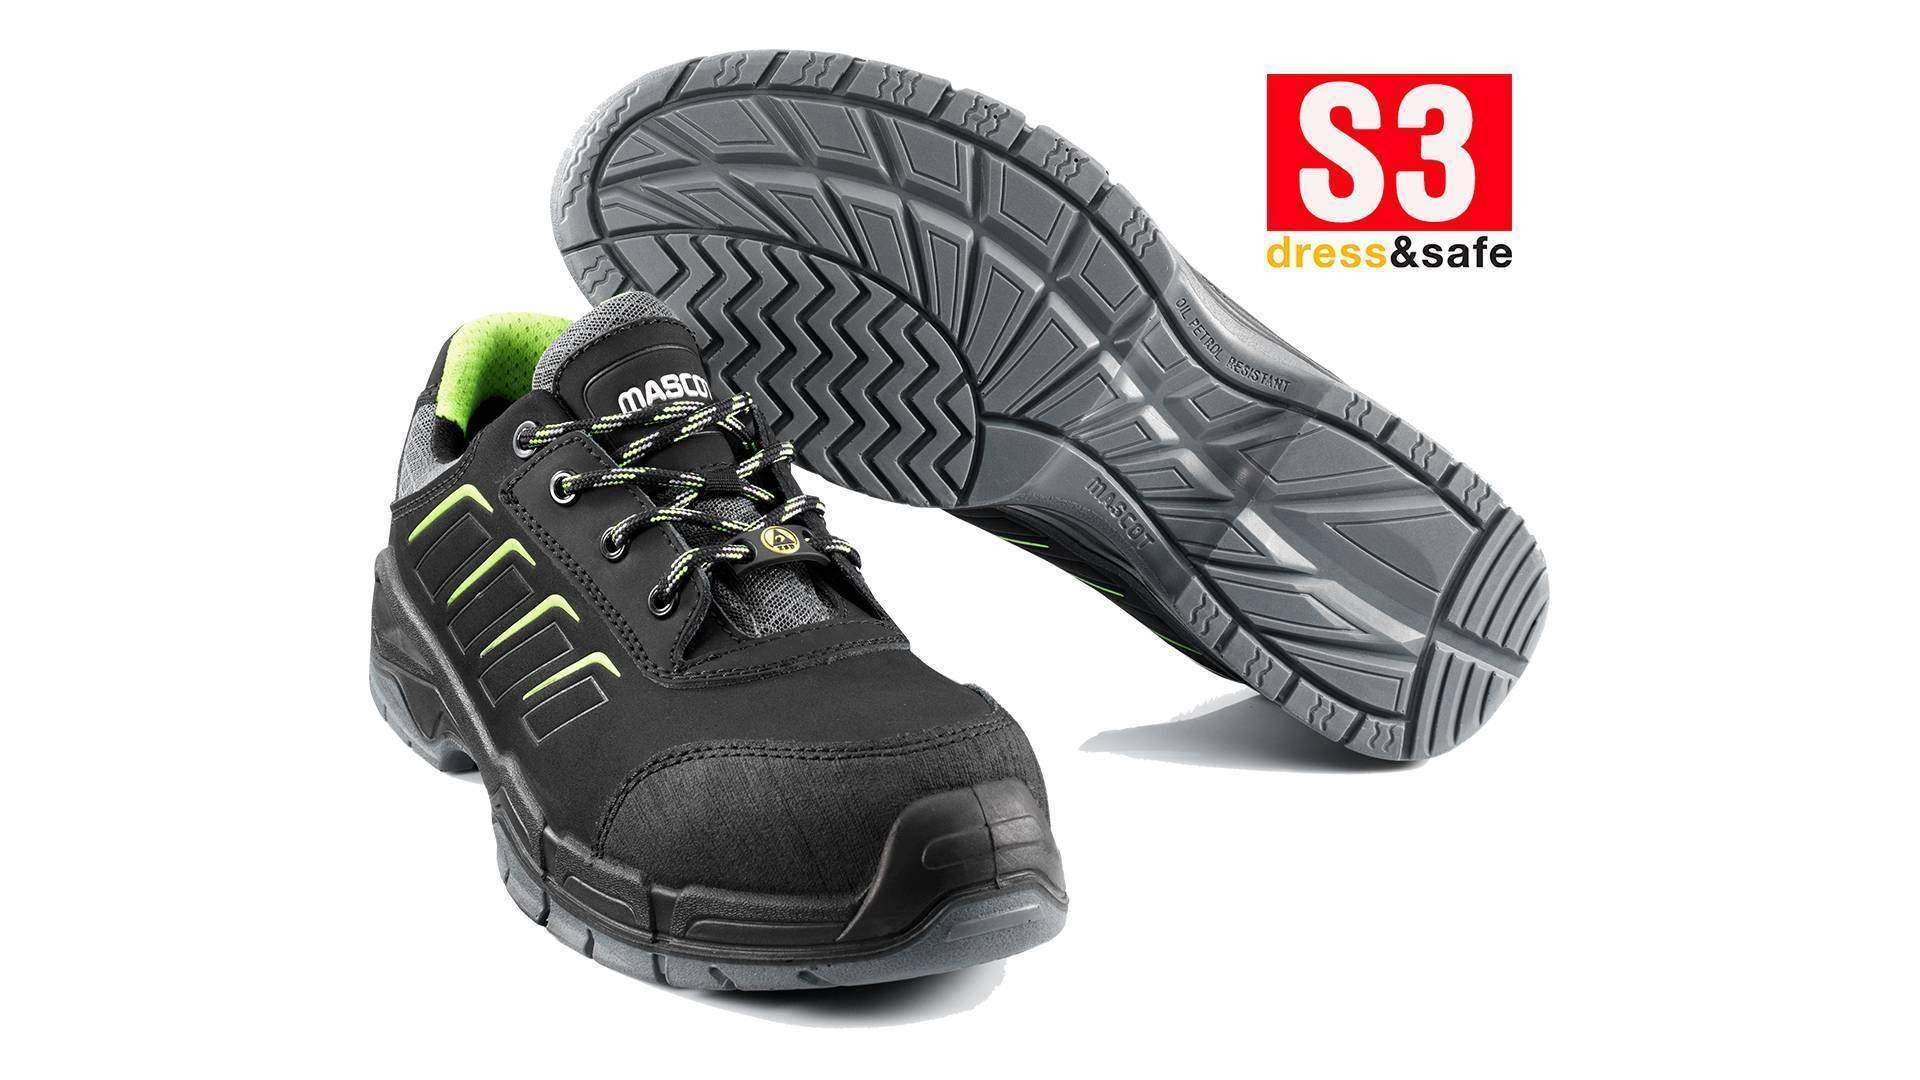 Scarpe Nike Scarpe Scarpe Antinfortunistiche Antinfortunistiche Antinfortunistiche Nike bf7vImgyY6